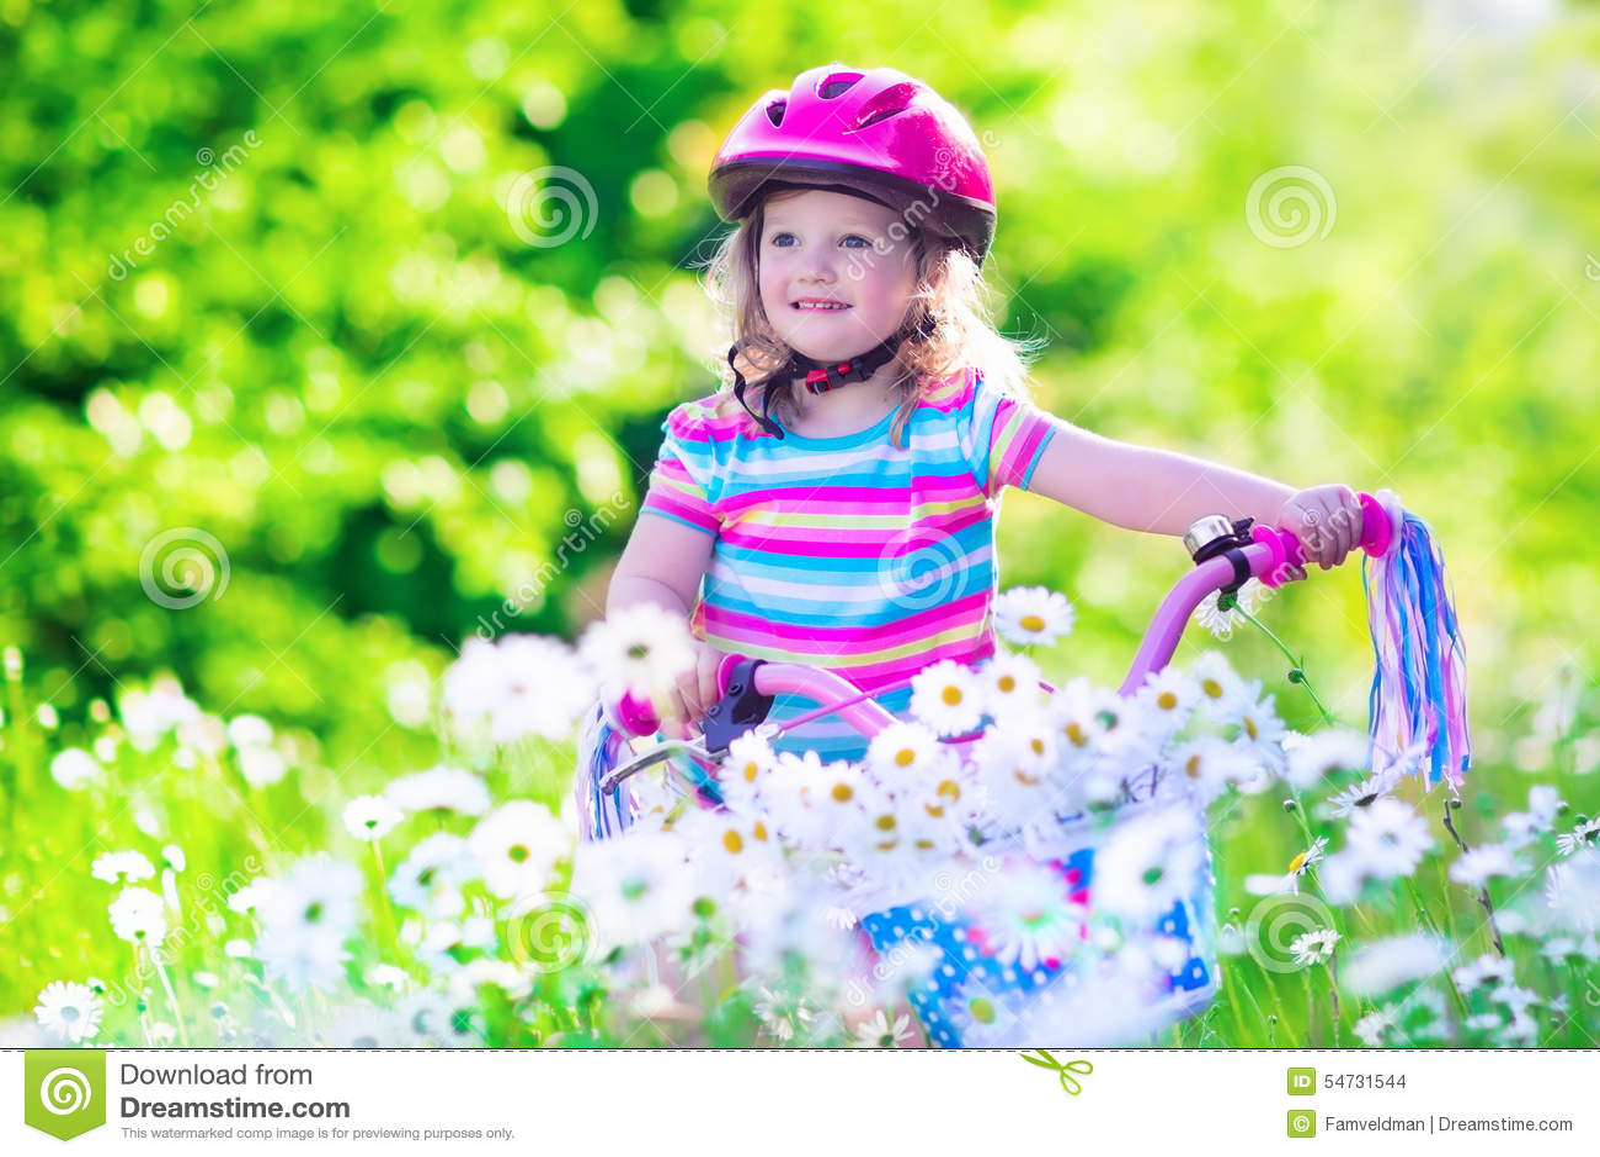 petite fille conduisant un v lo photo stock image 54731544. Black Bedroom Furniture Sets. Home Design Ideas